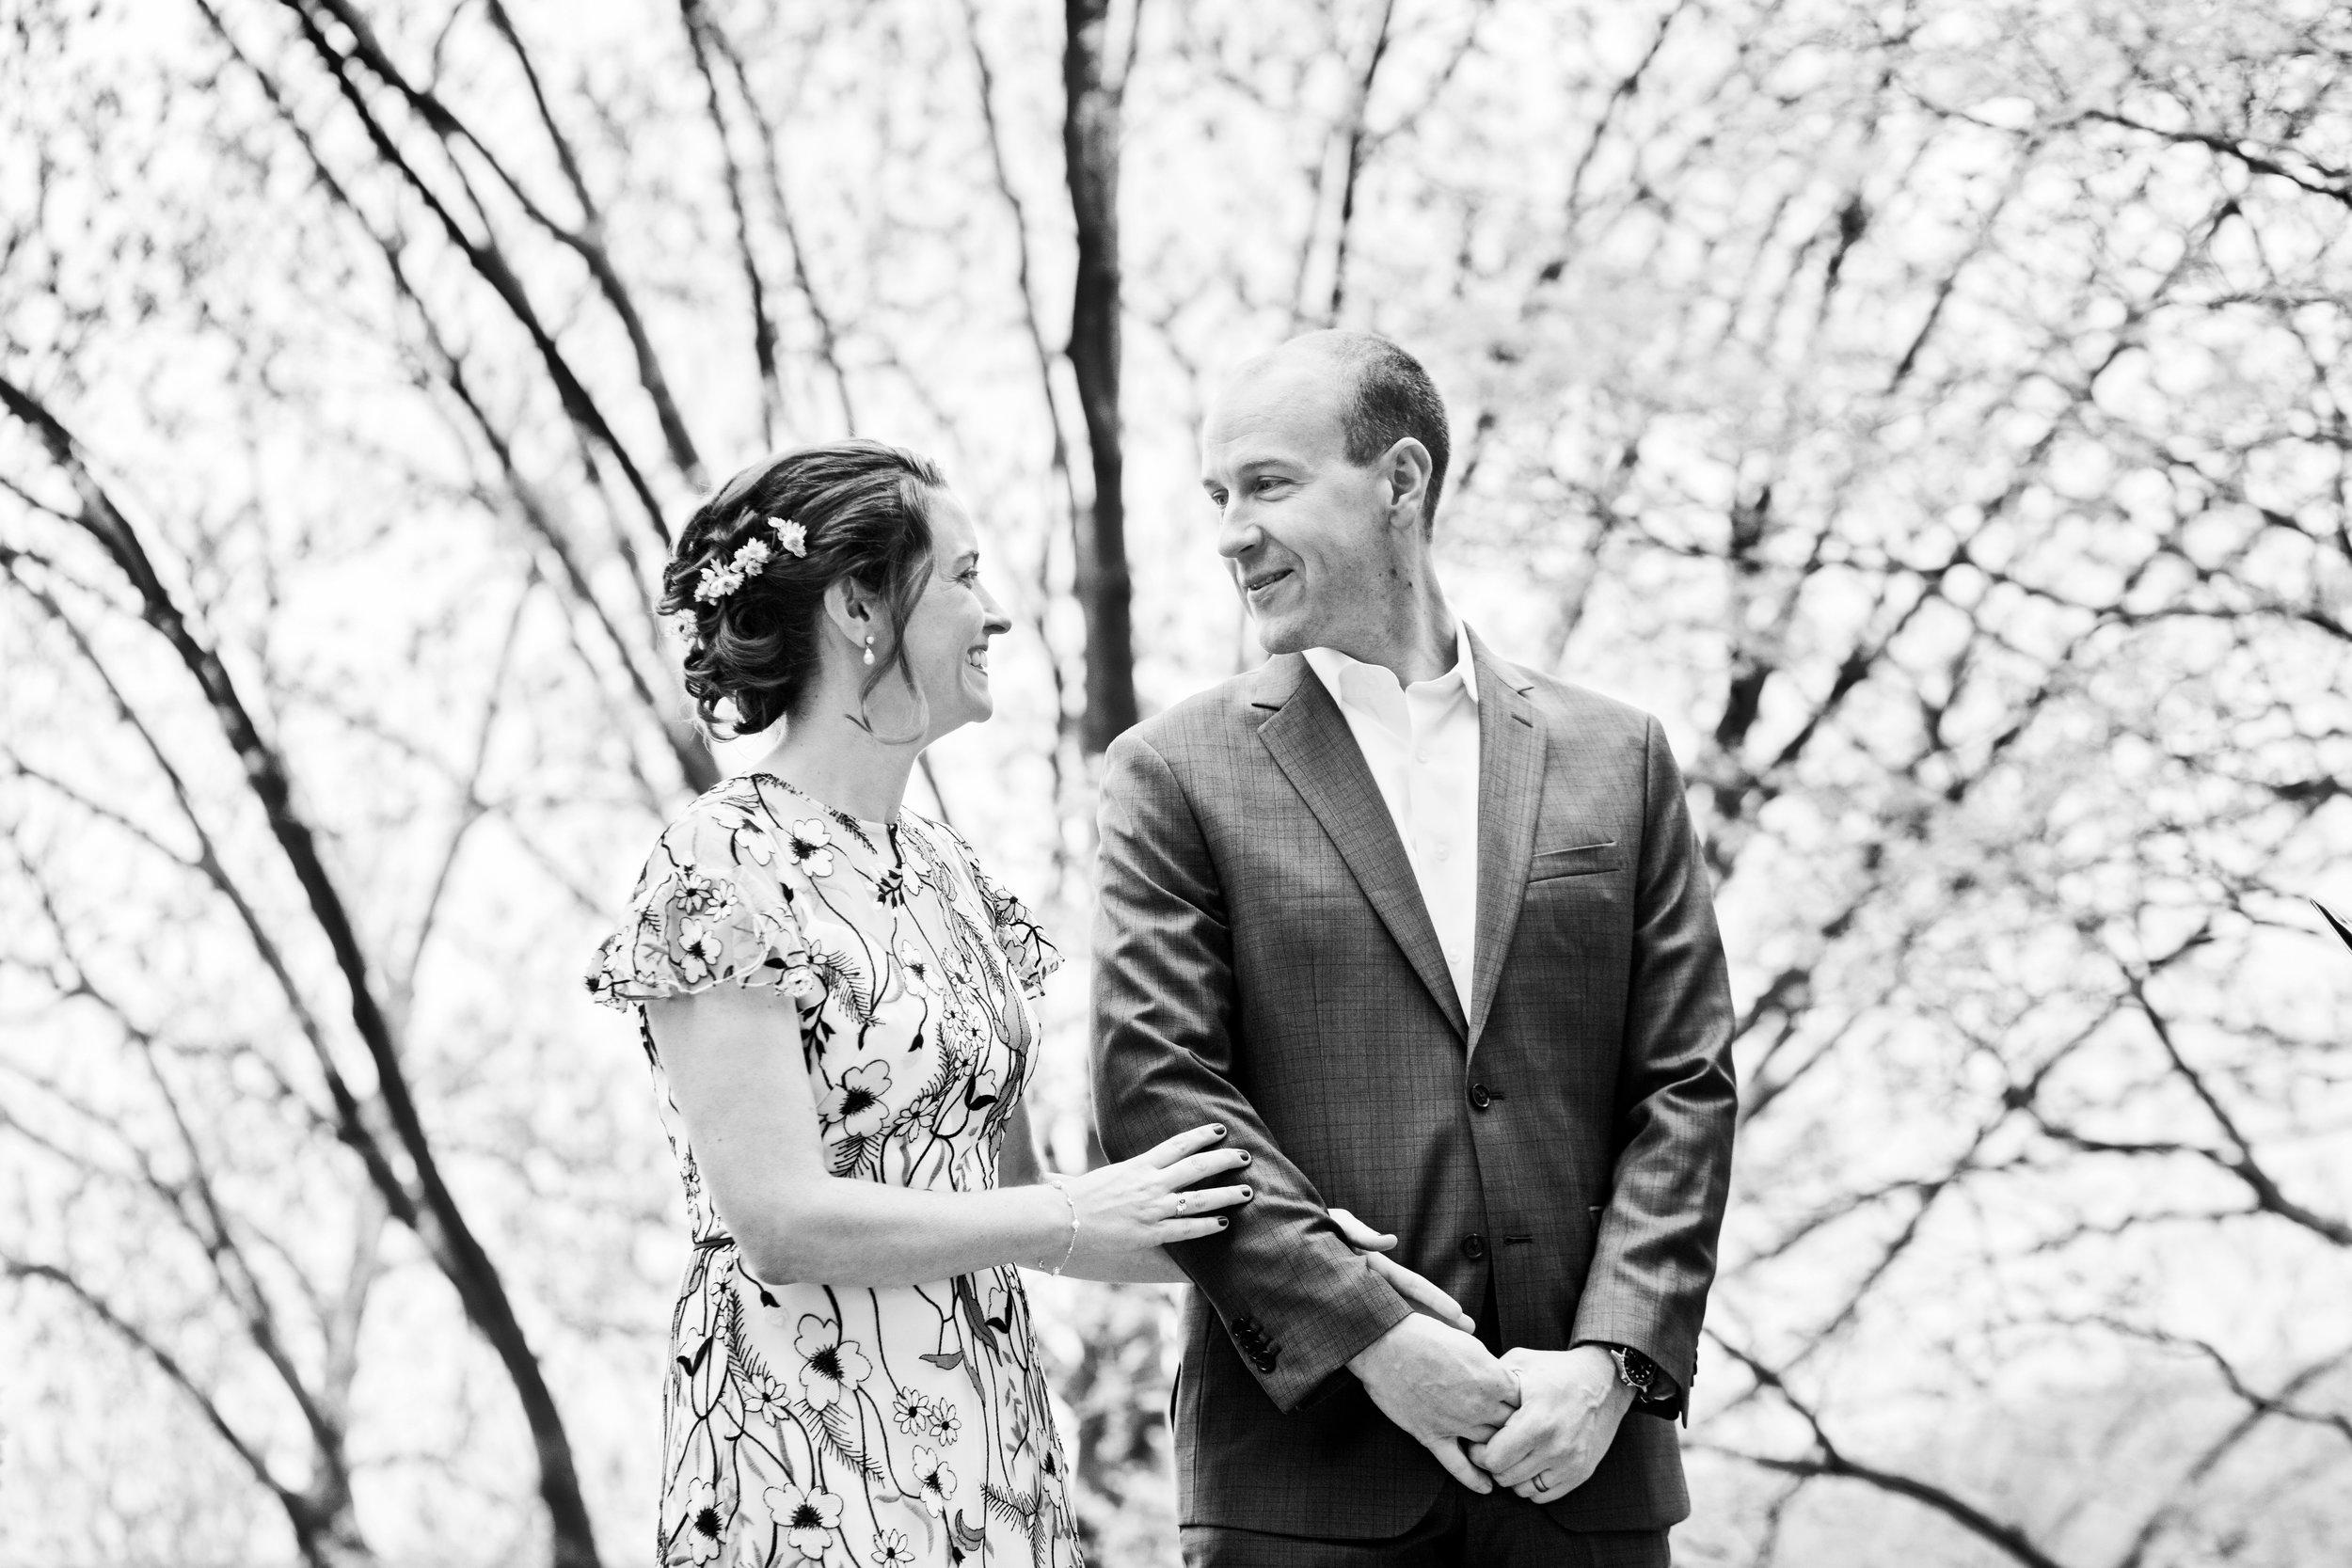 Fresh-pond-wedding-cambridge-ma-008.JPG